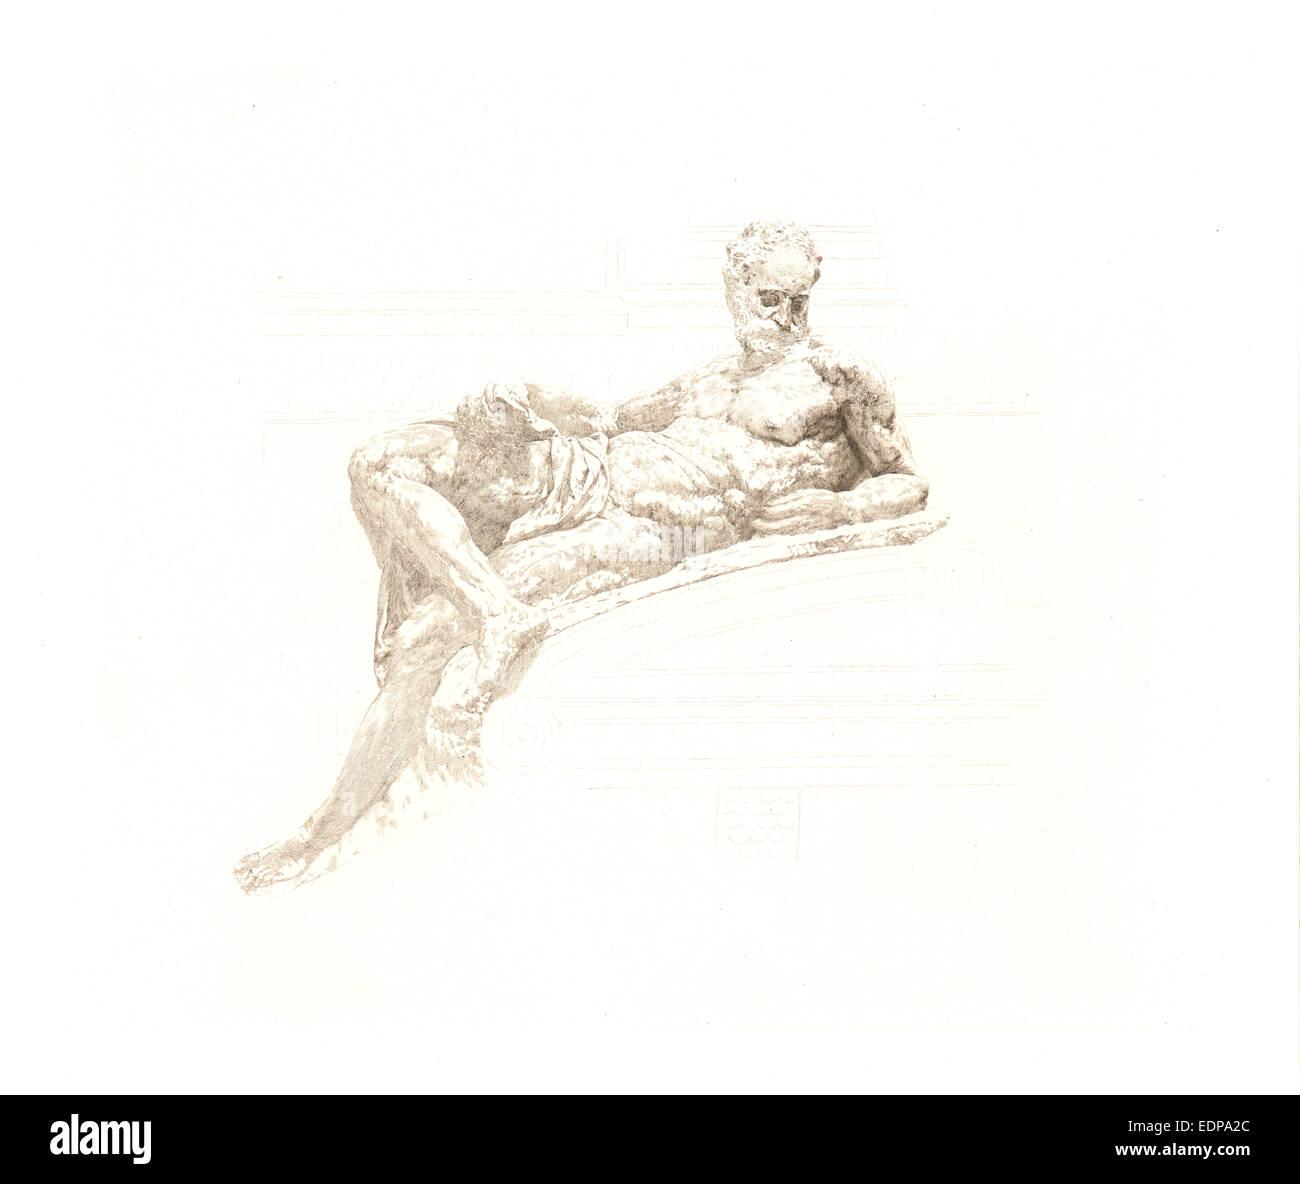 Claude-Ferdinand Gaillard (French, 1834 - 1887) after Michelangelo Buonarroti (Italian, 1475 - 1564). Le Crépuscule, - Stock Image